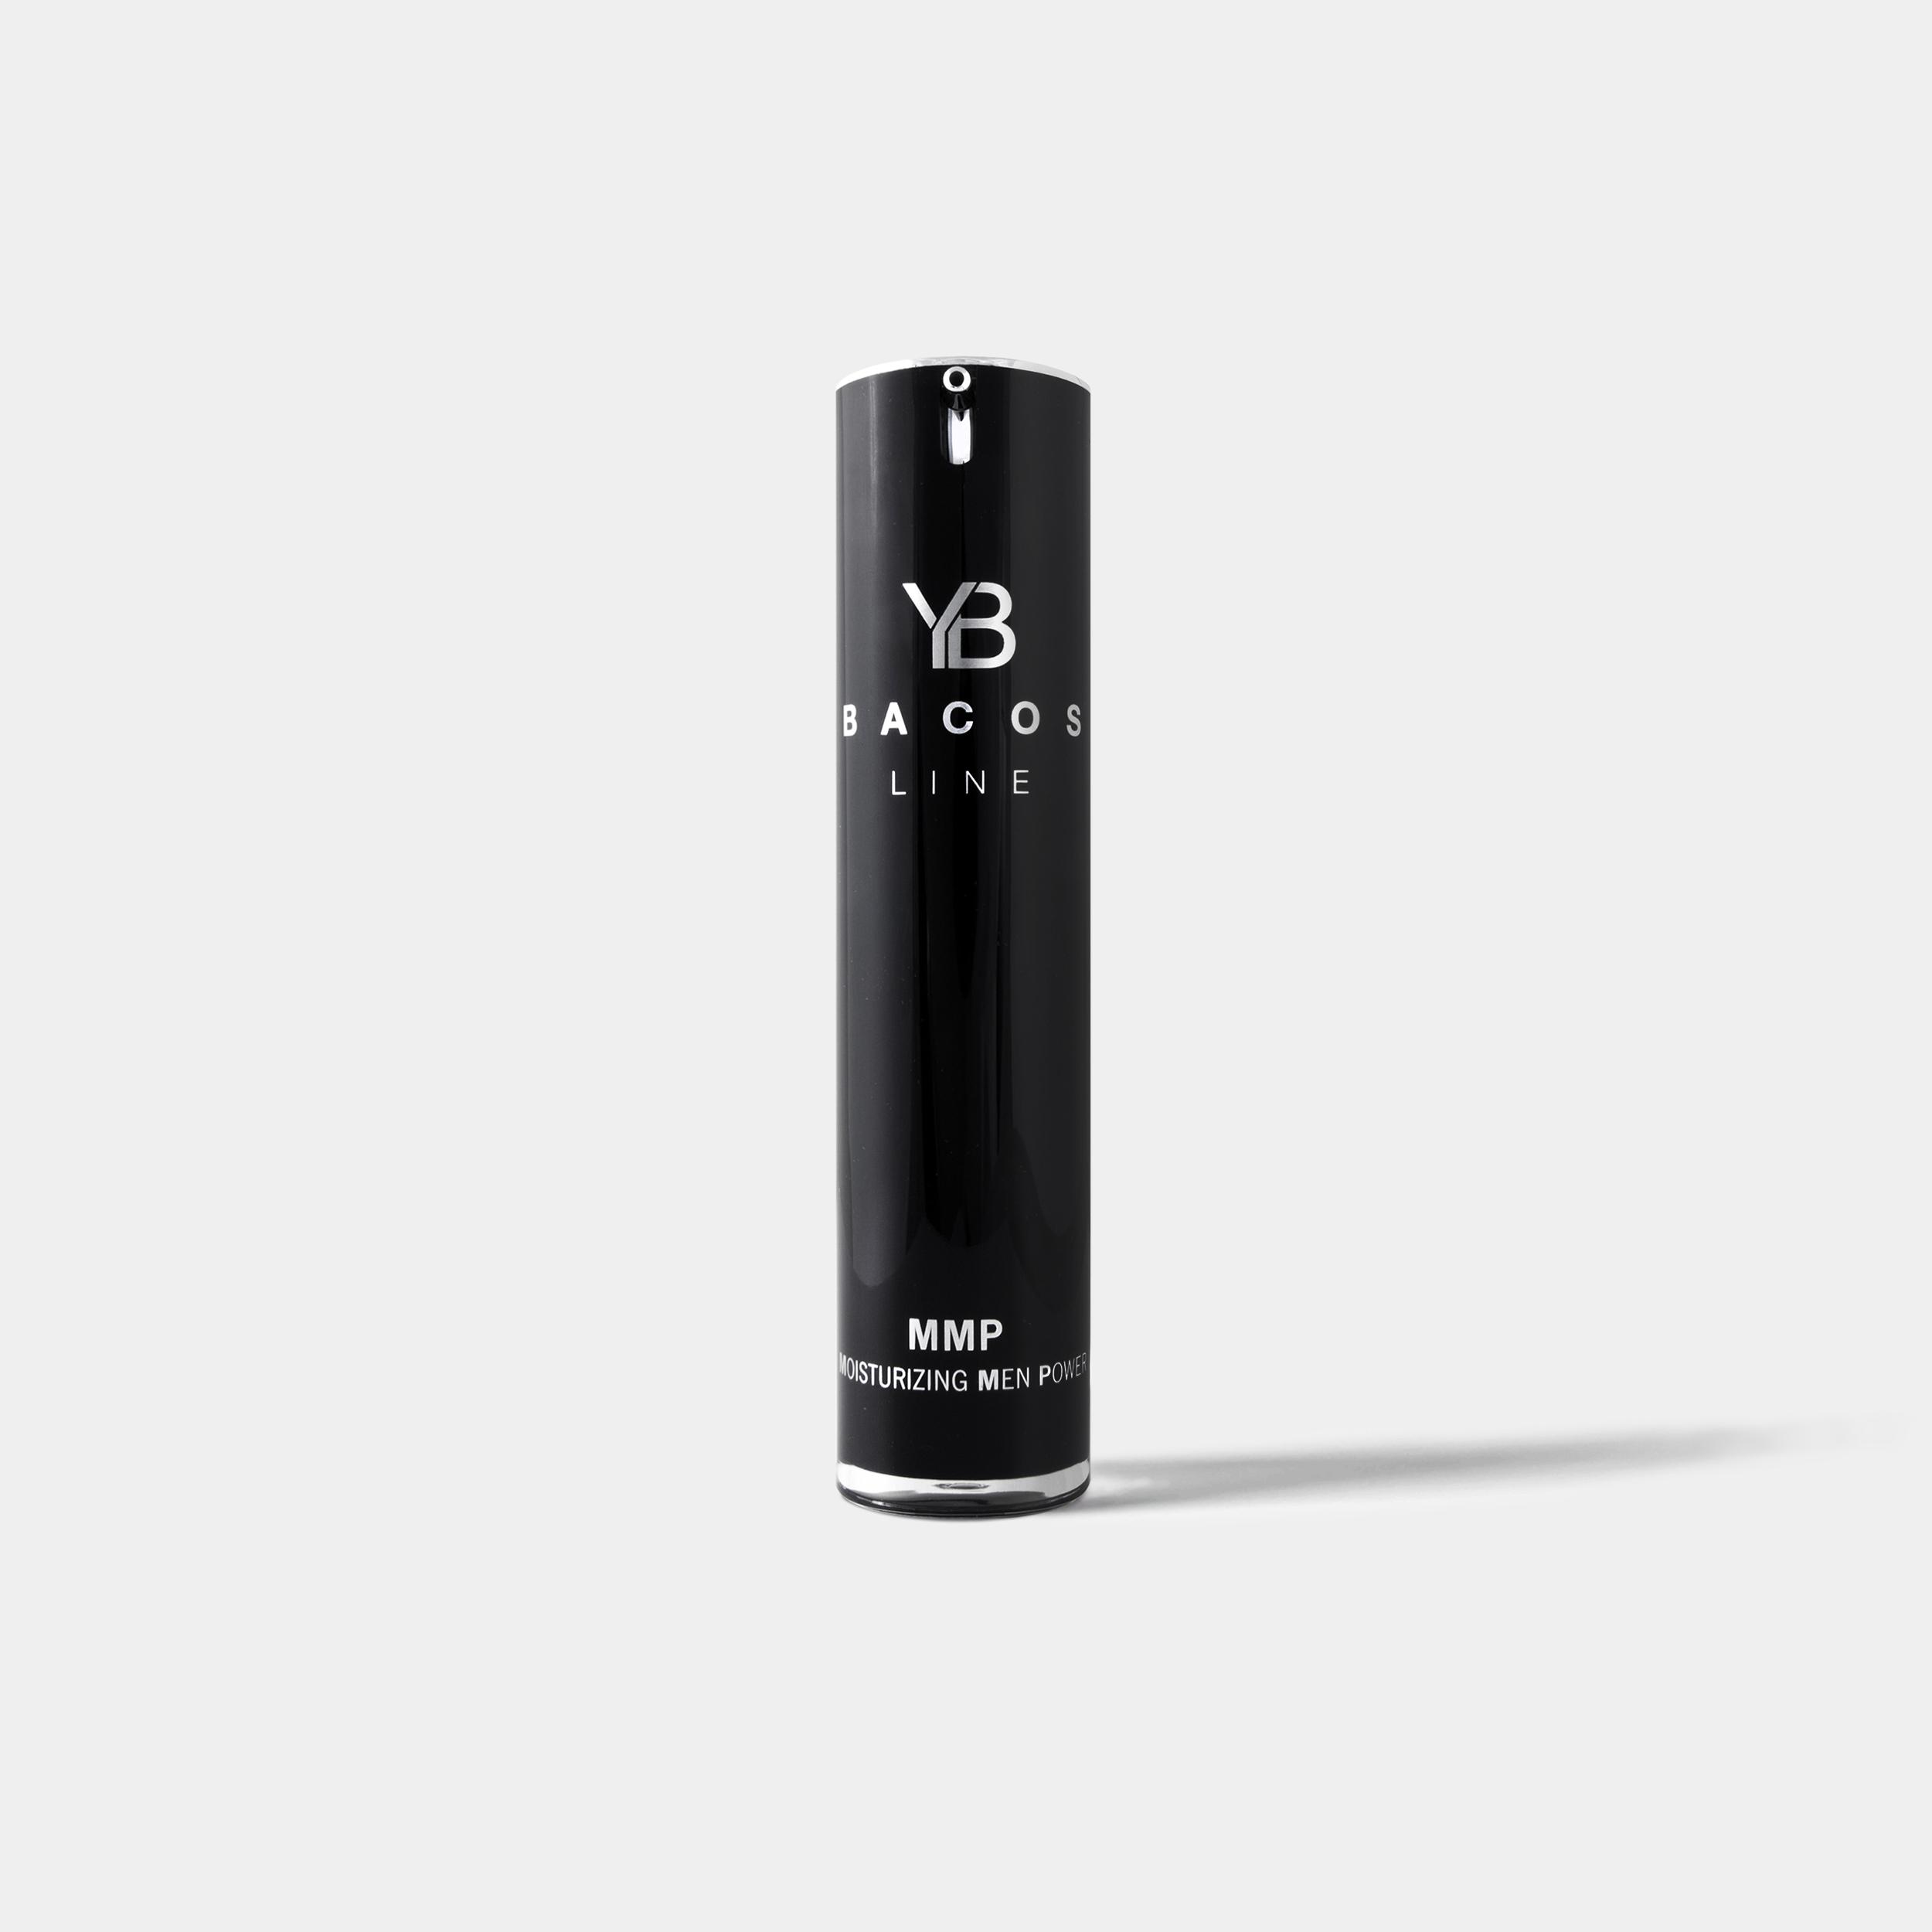 YB BACOS LINE MMP MOISTURIZING MAN POWER - 50 ml